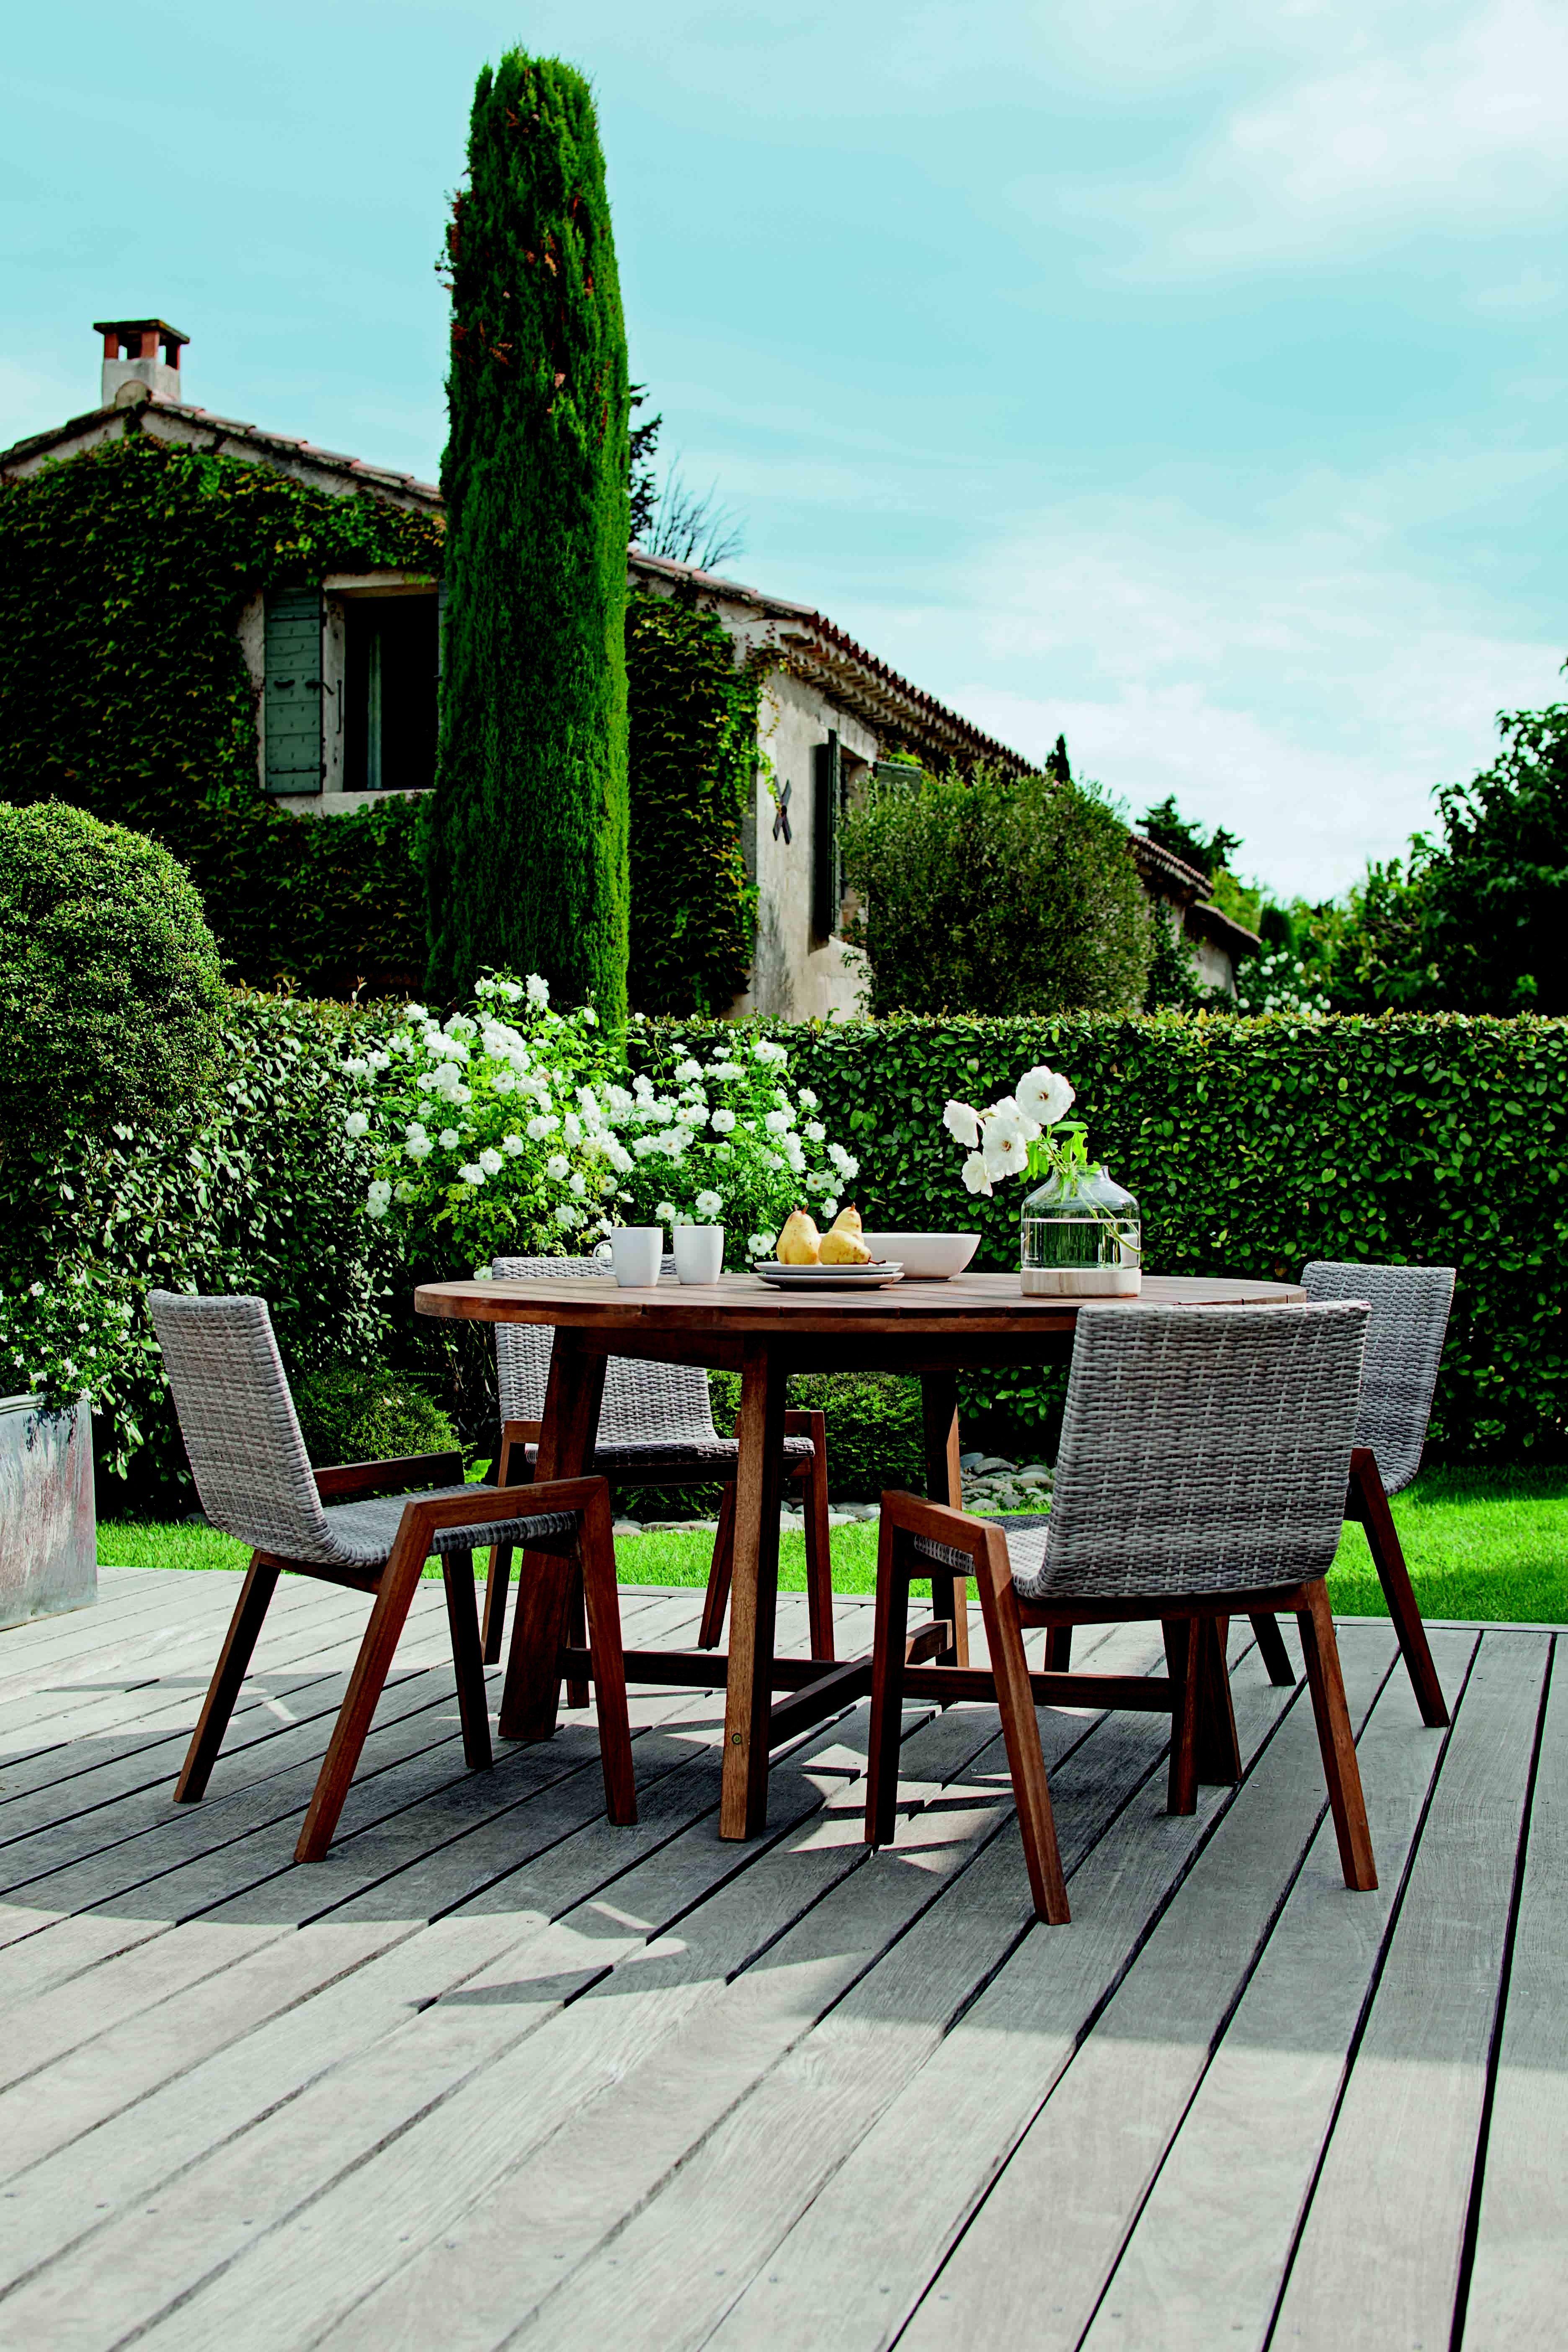 Salon de jardin azal e chez jardiland salon de jardin for Mobilier jardin bois